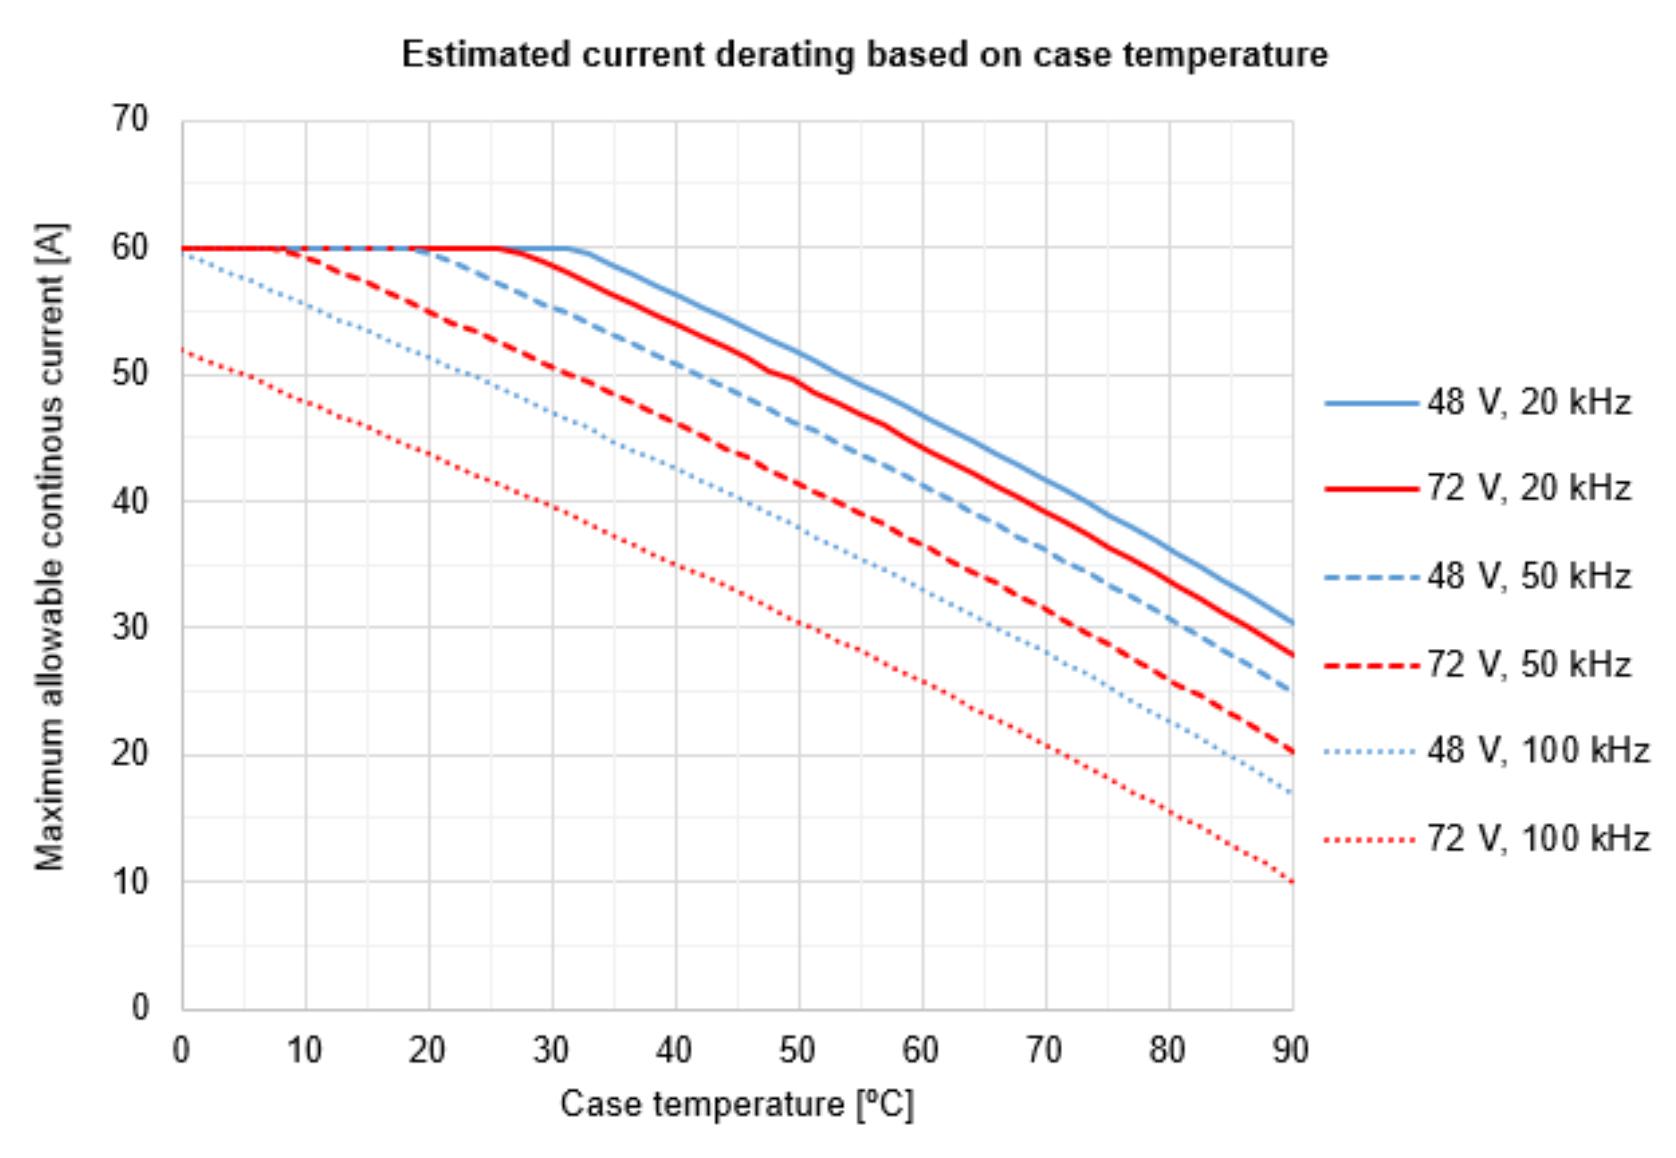 Estimated current derating based on case temperature